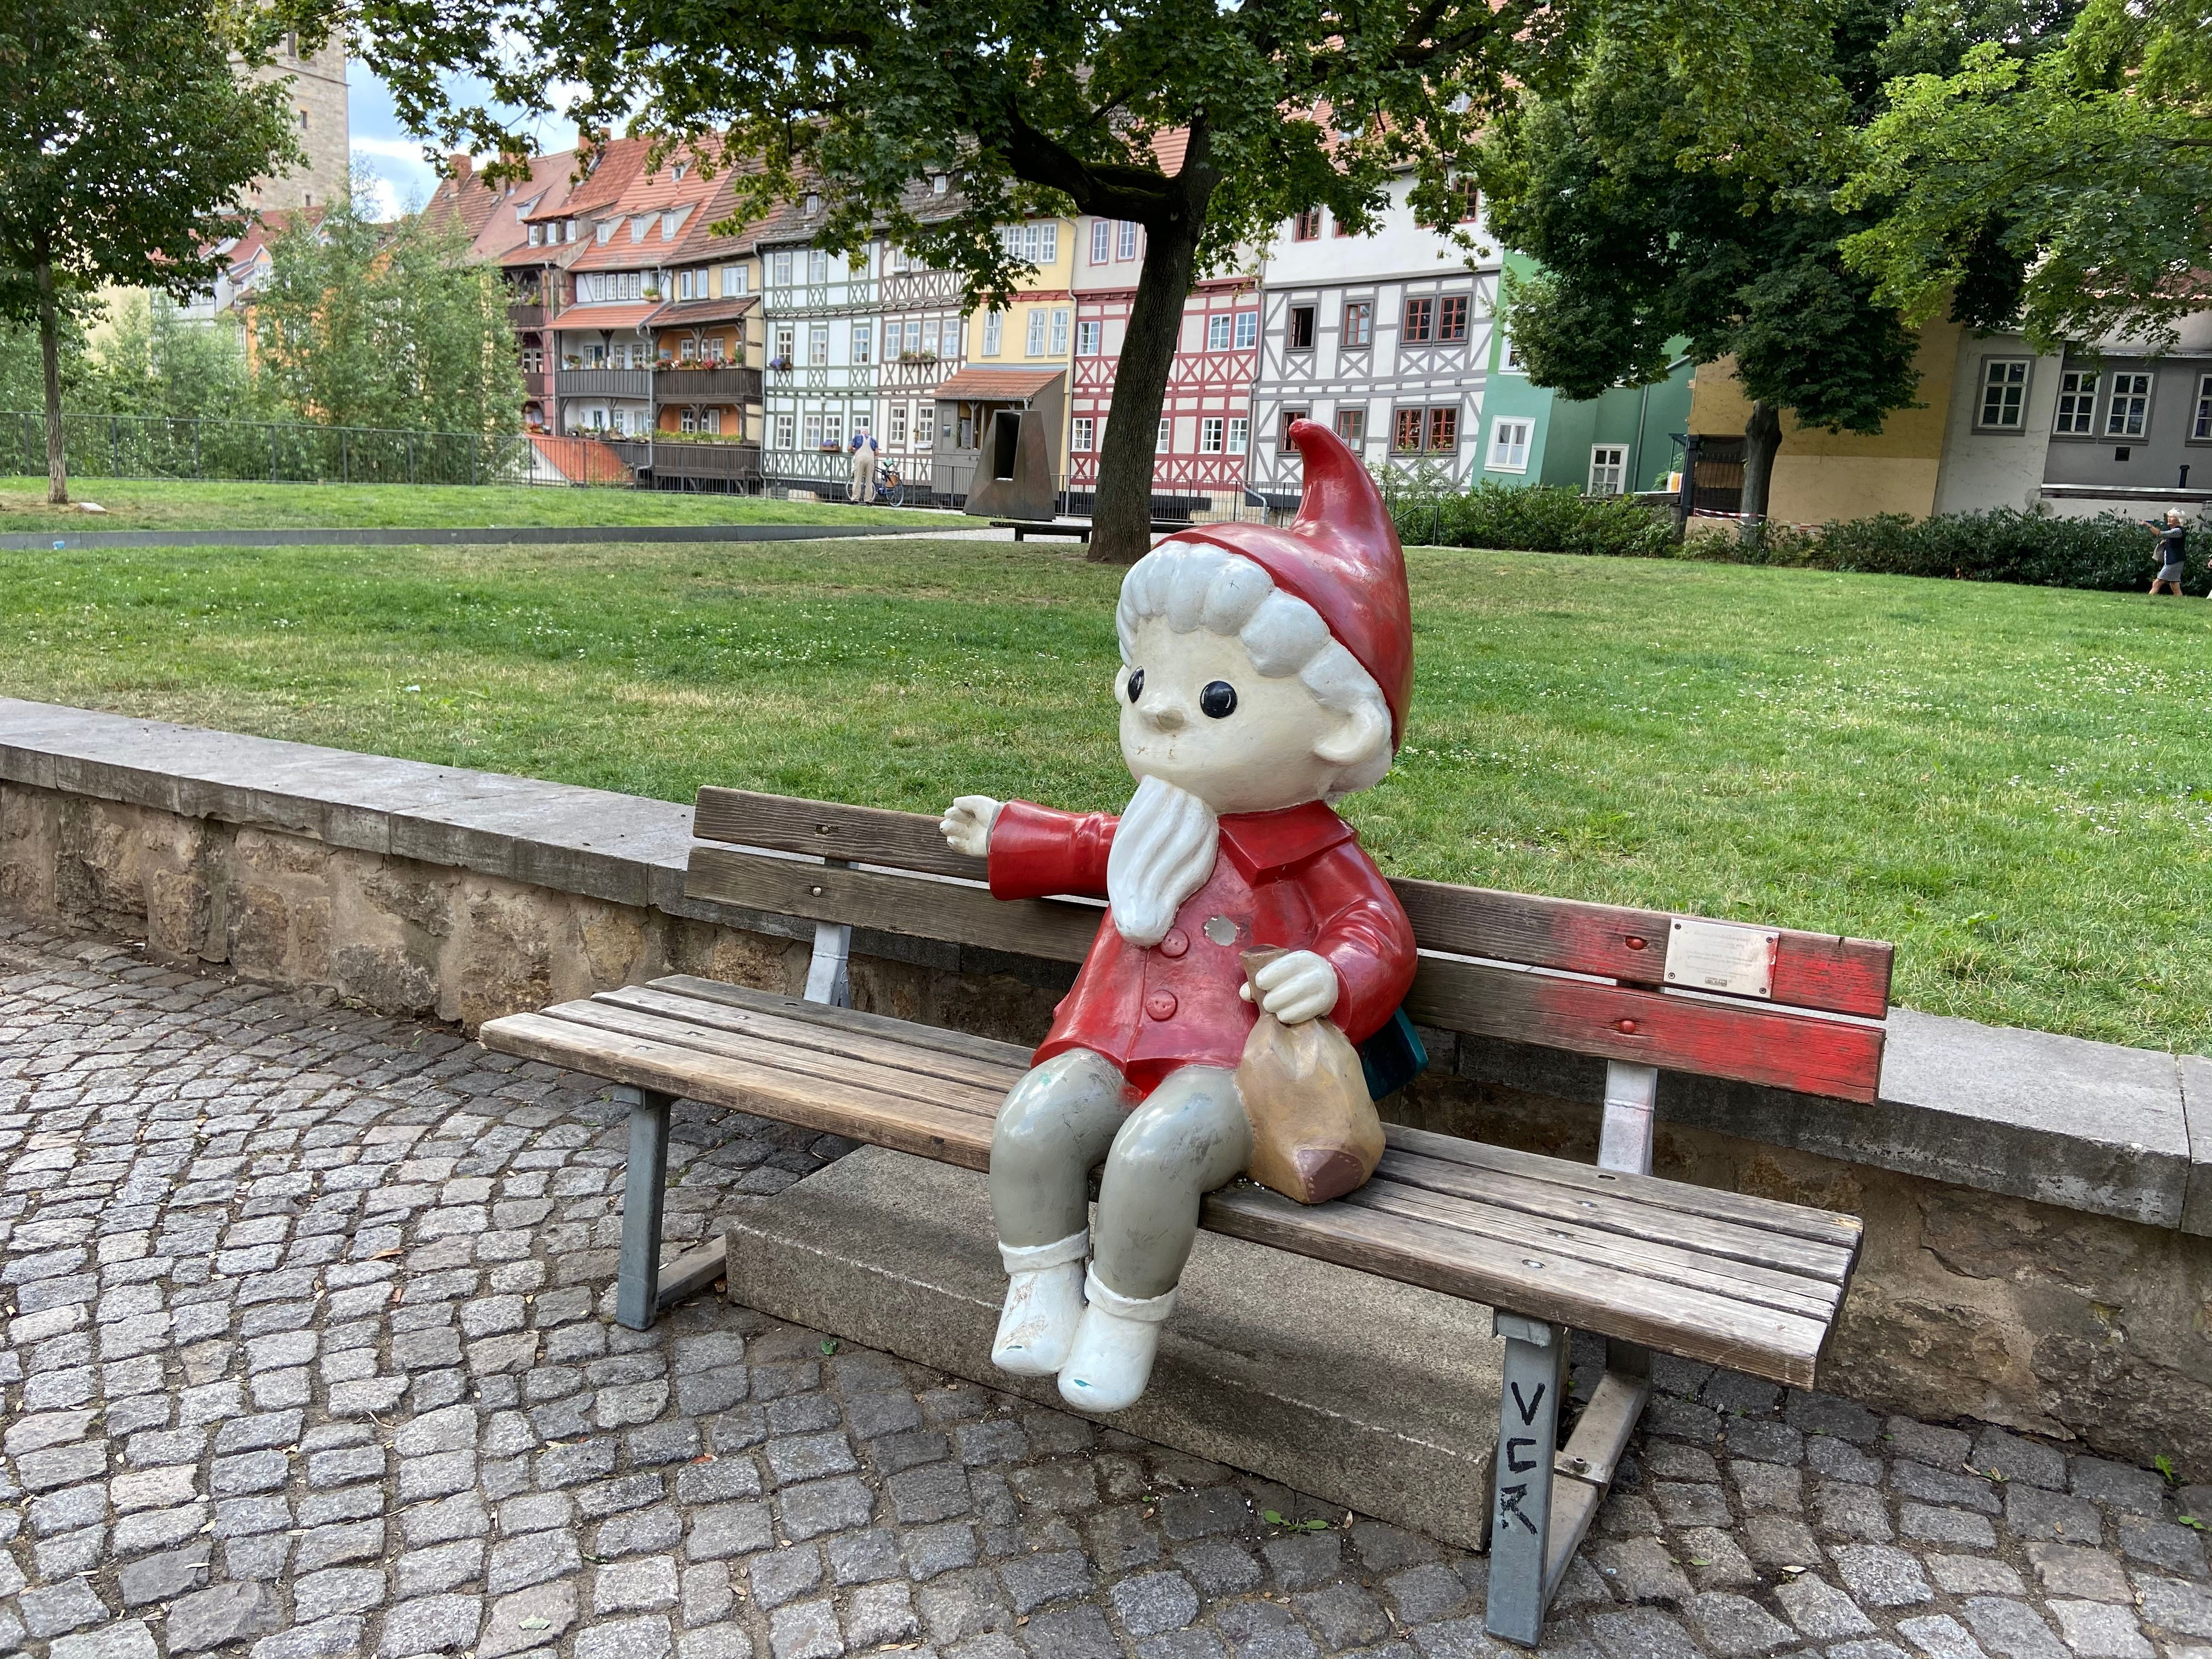 KiKA Figuren Erfurt: Sandmann